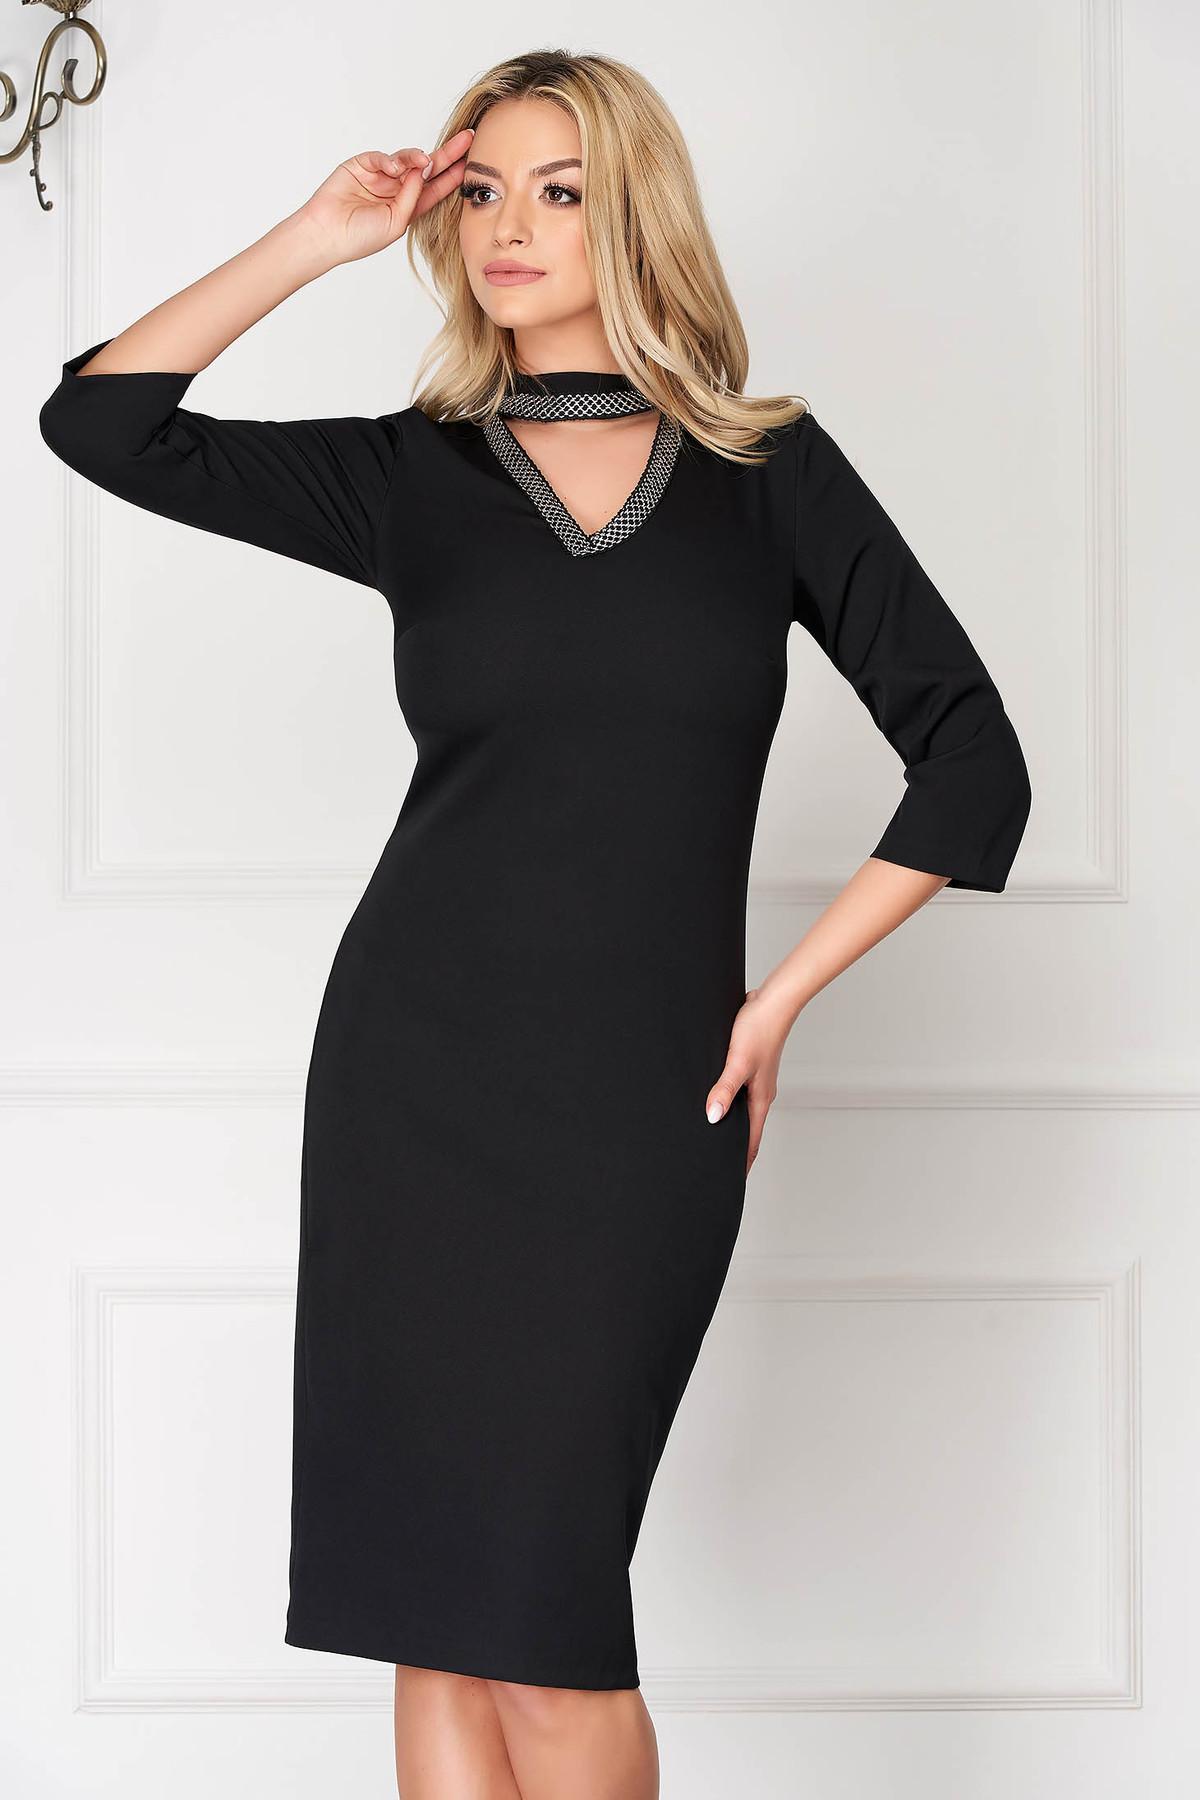 Rochie neagra eleganta midi tip creion decupat la bust cu maneci trei-sferturi